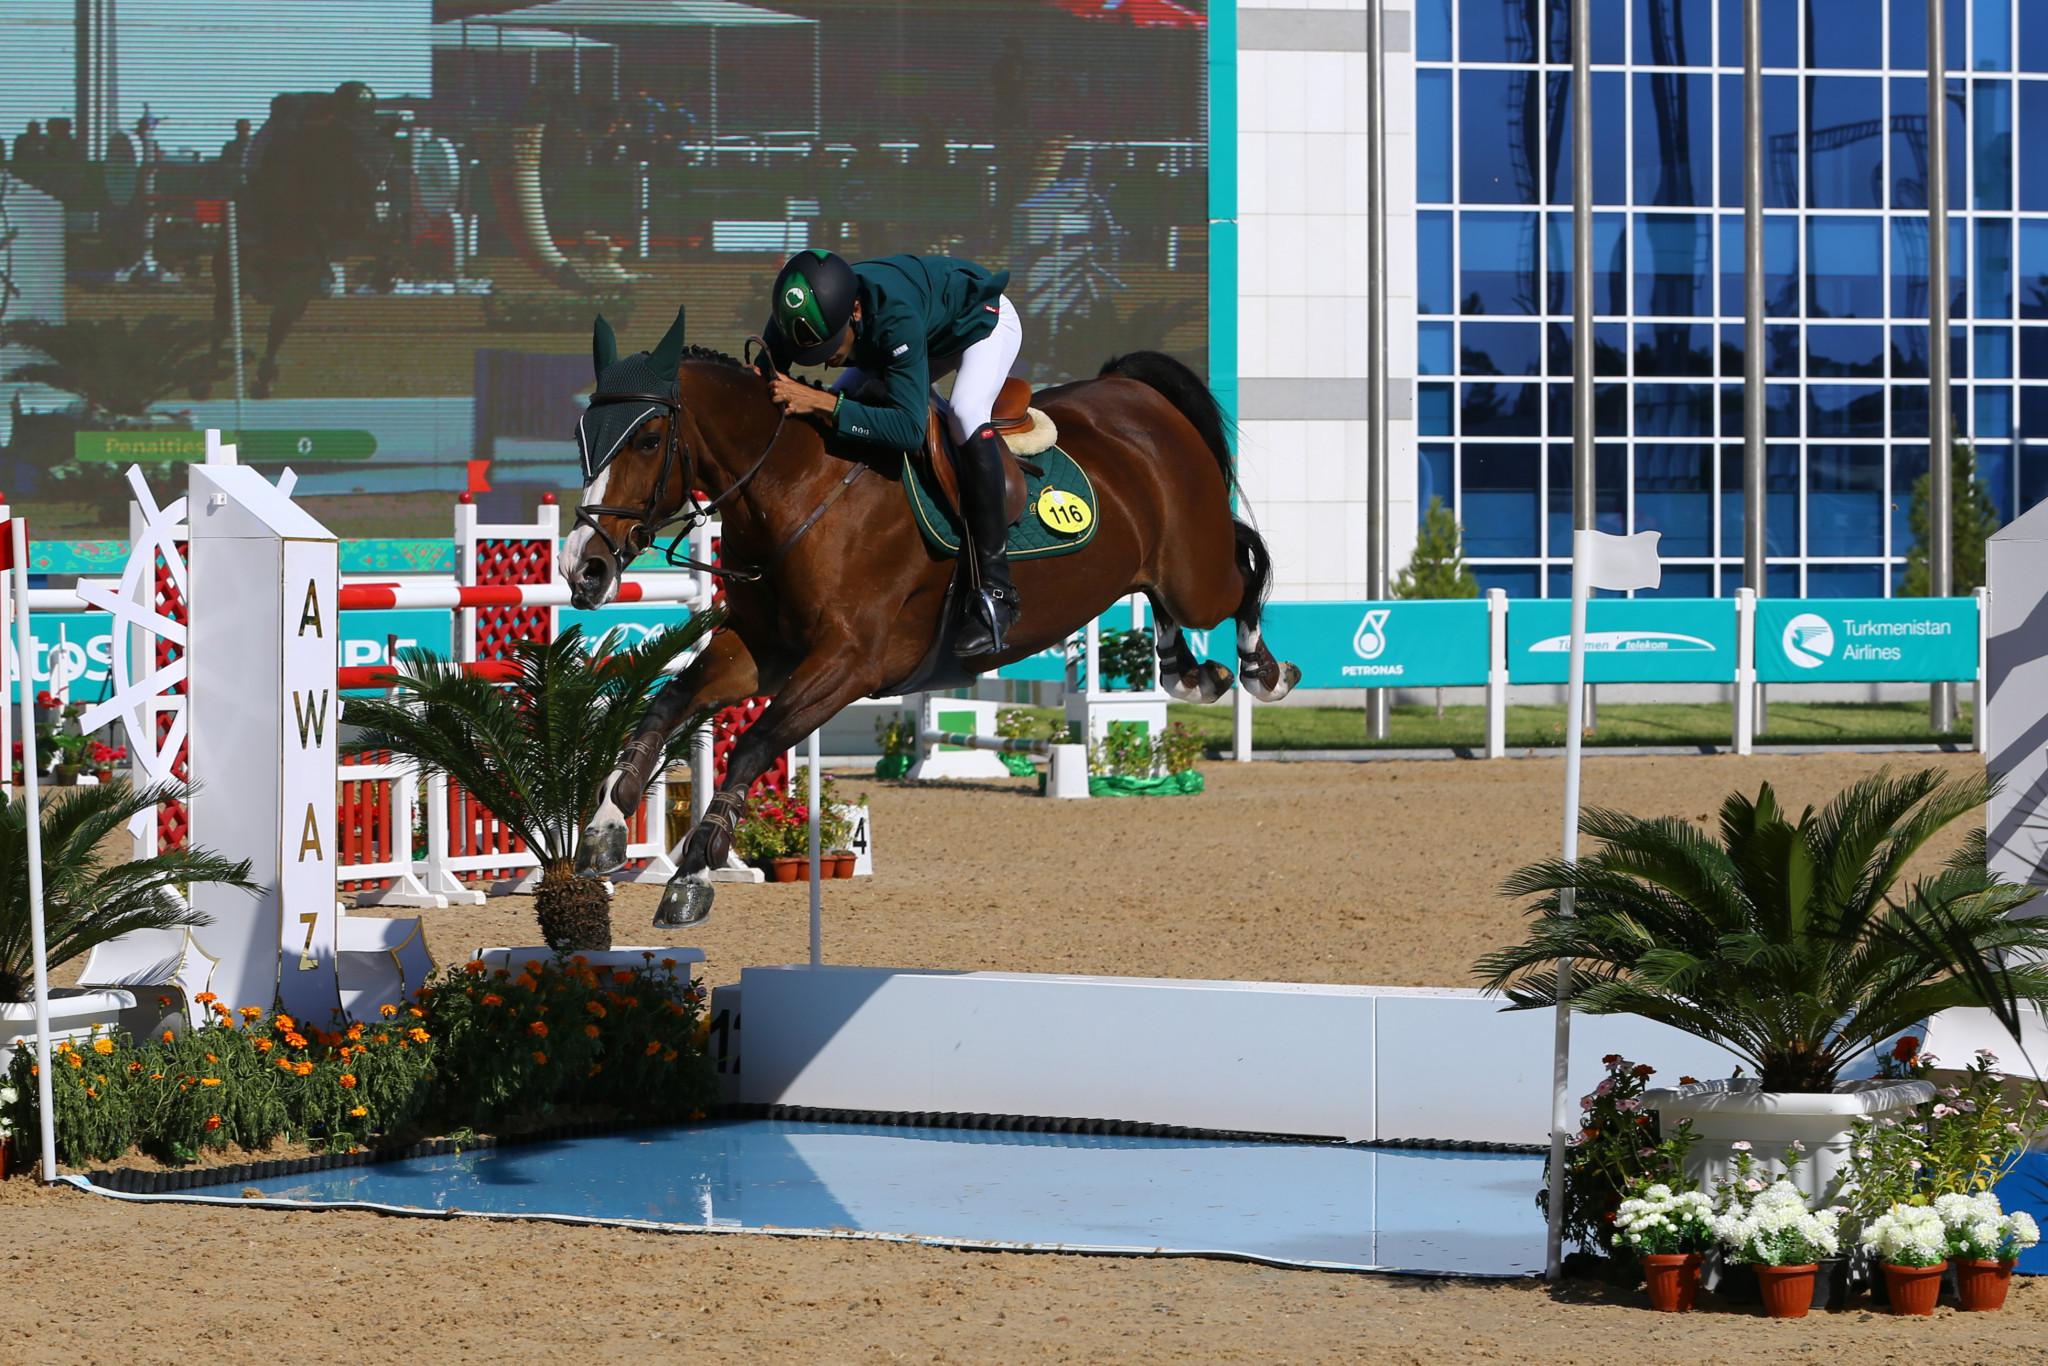 Saudi Arabia's Khaled Abdulrahman S Almobty had to settle for the silver medal ©Ashgabat 2017/Lazaros Koukorikos/LAUREL Photo Services